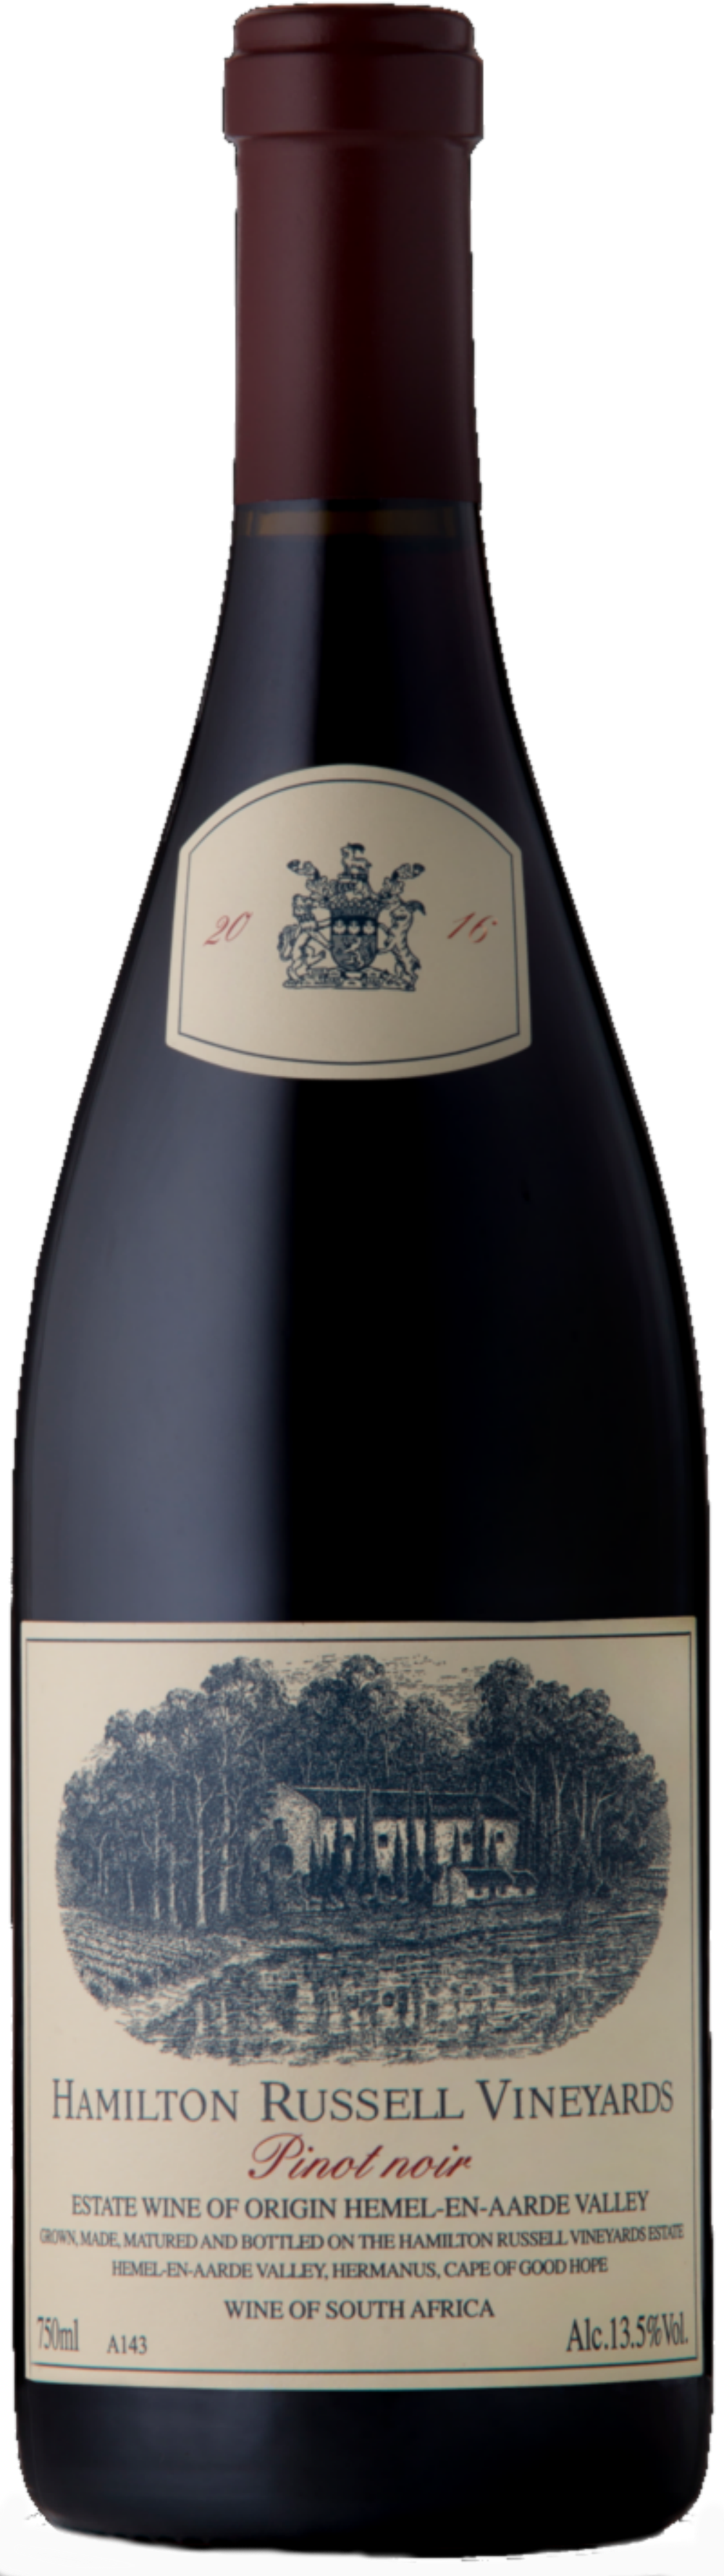 Hamilton Russell Chardonnay 2019-0